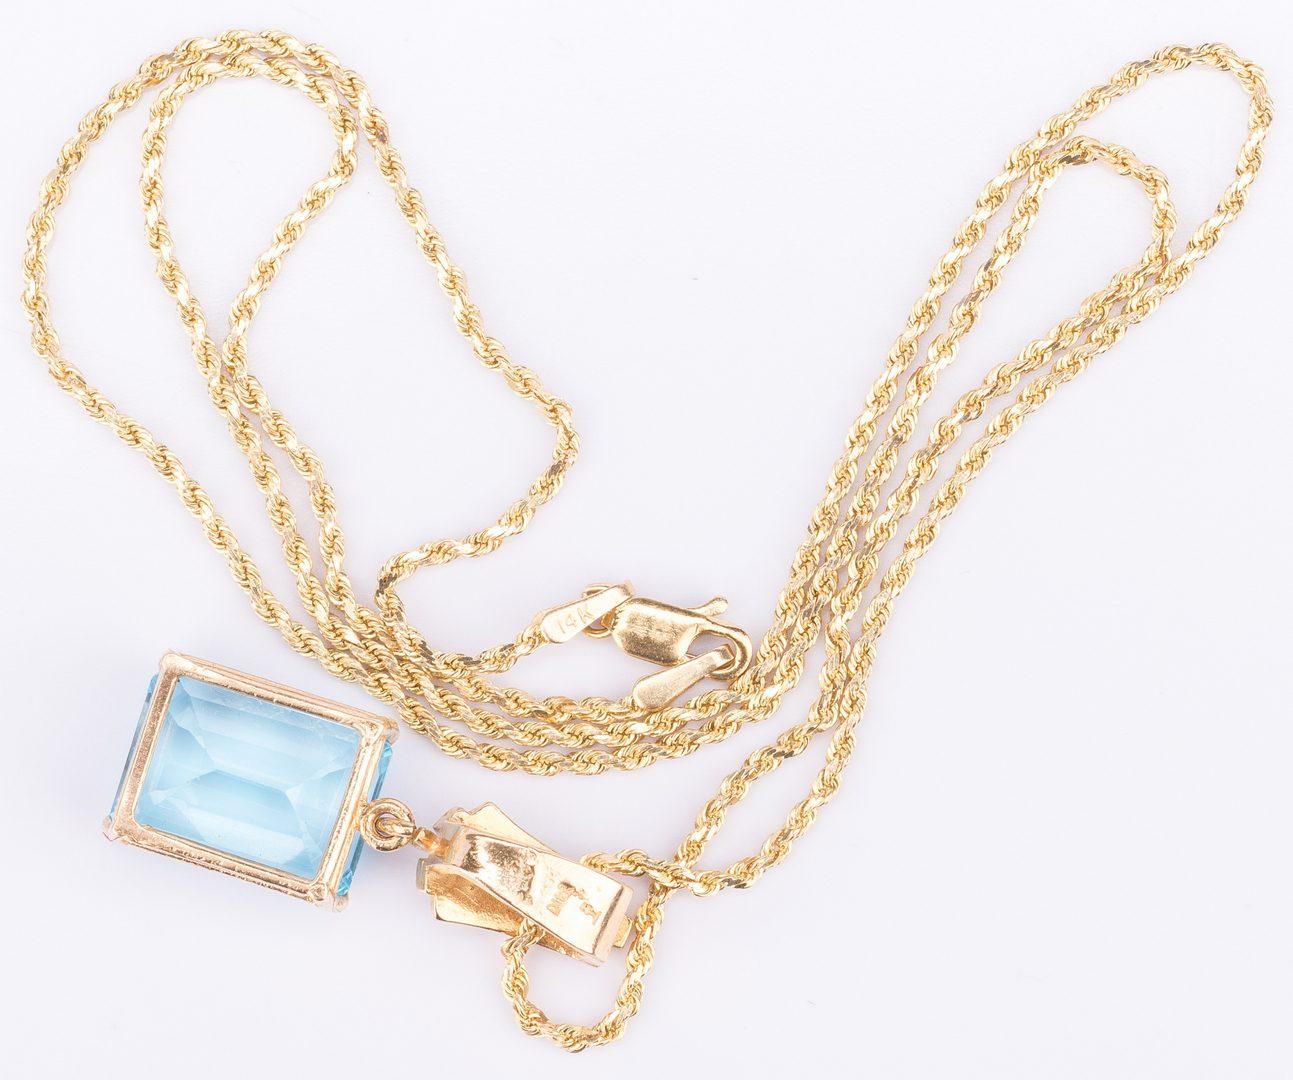 Lot 34: 14K Blue Topaz Enhancer, 20 inch rope chain